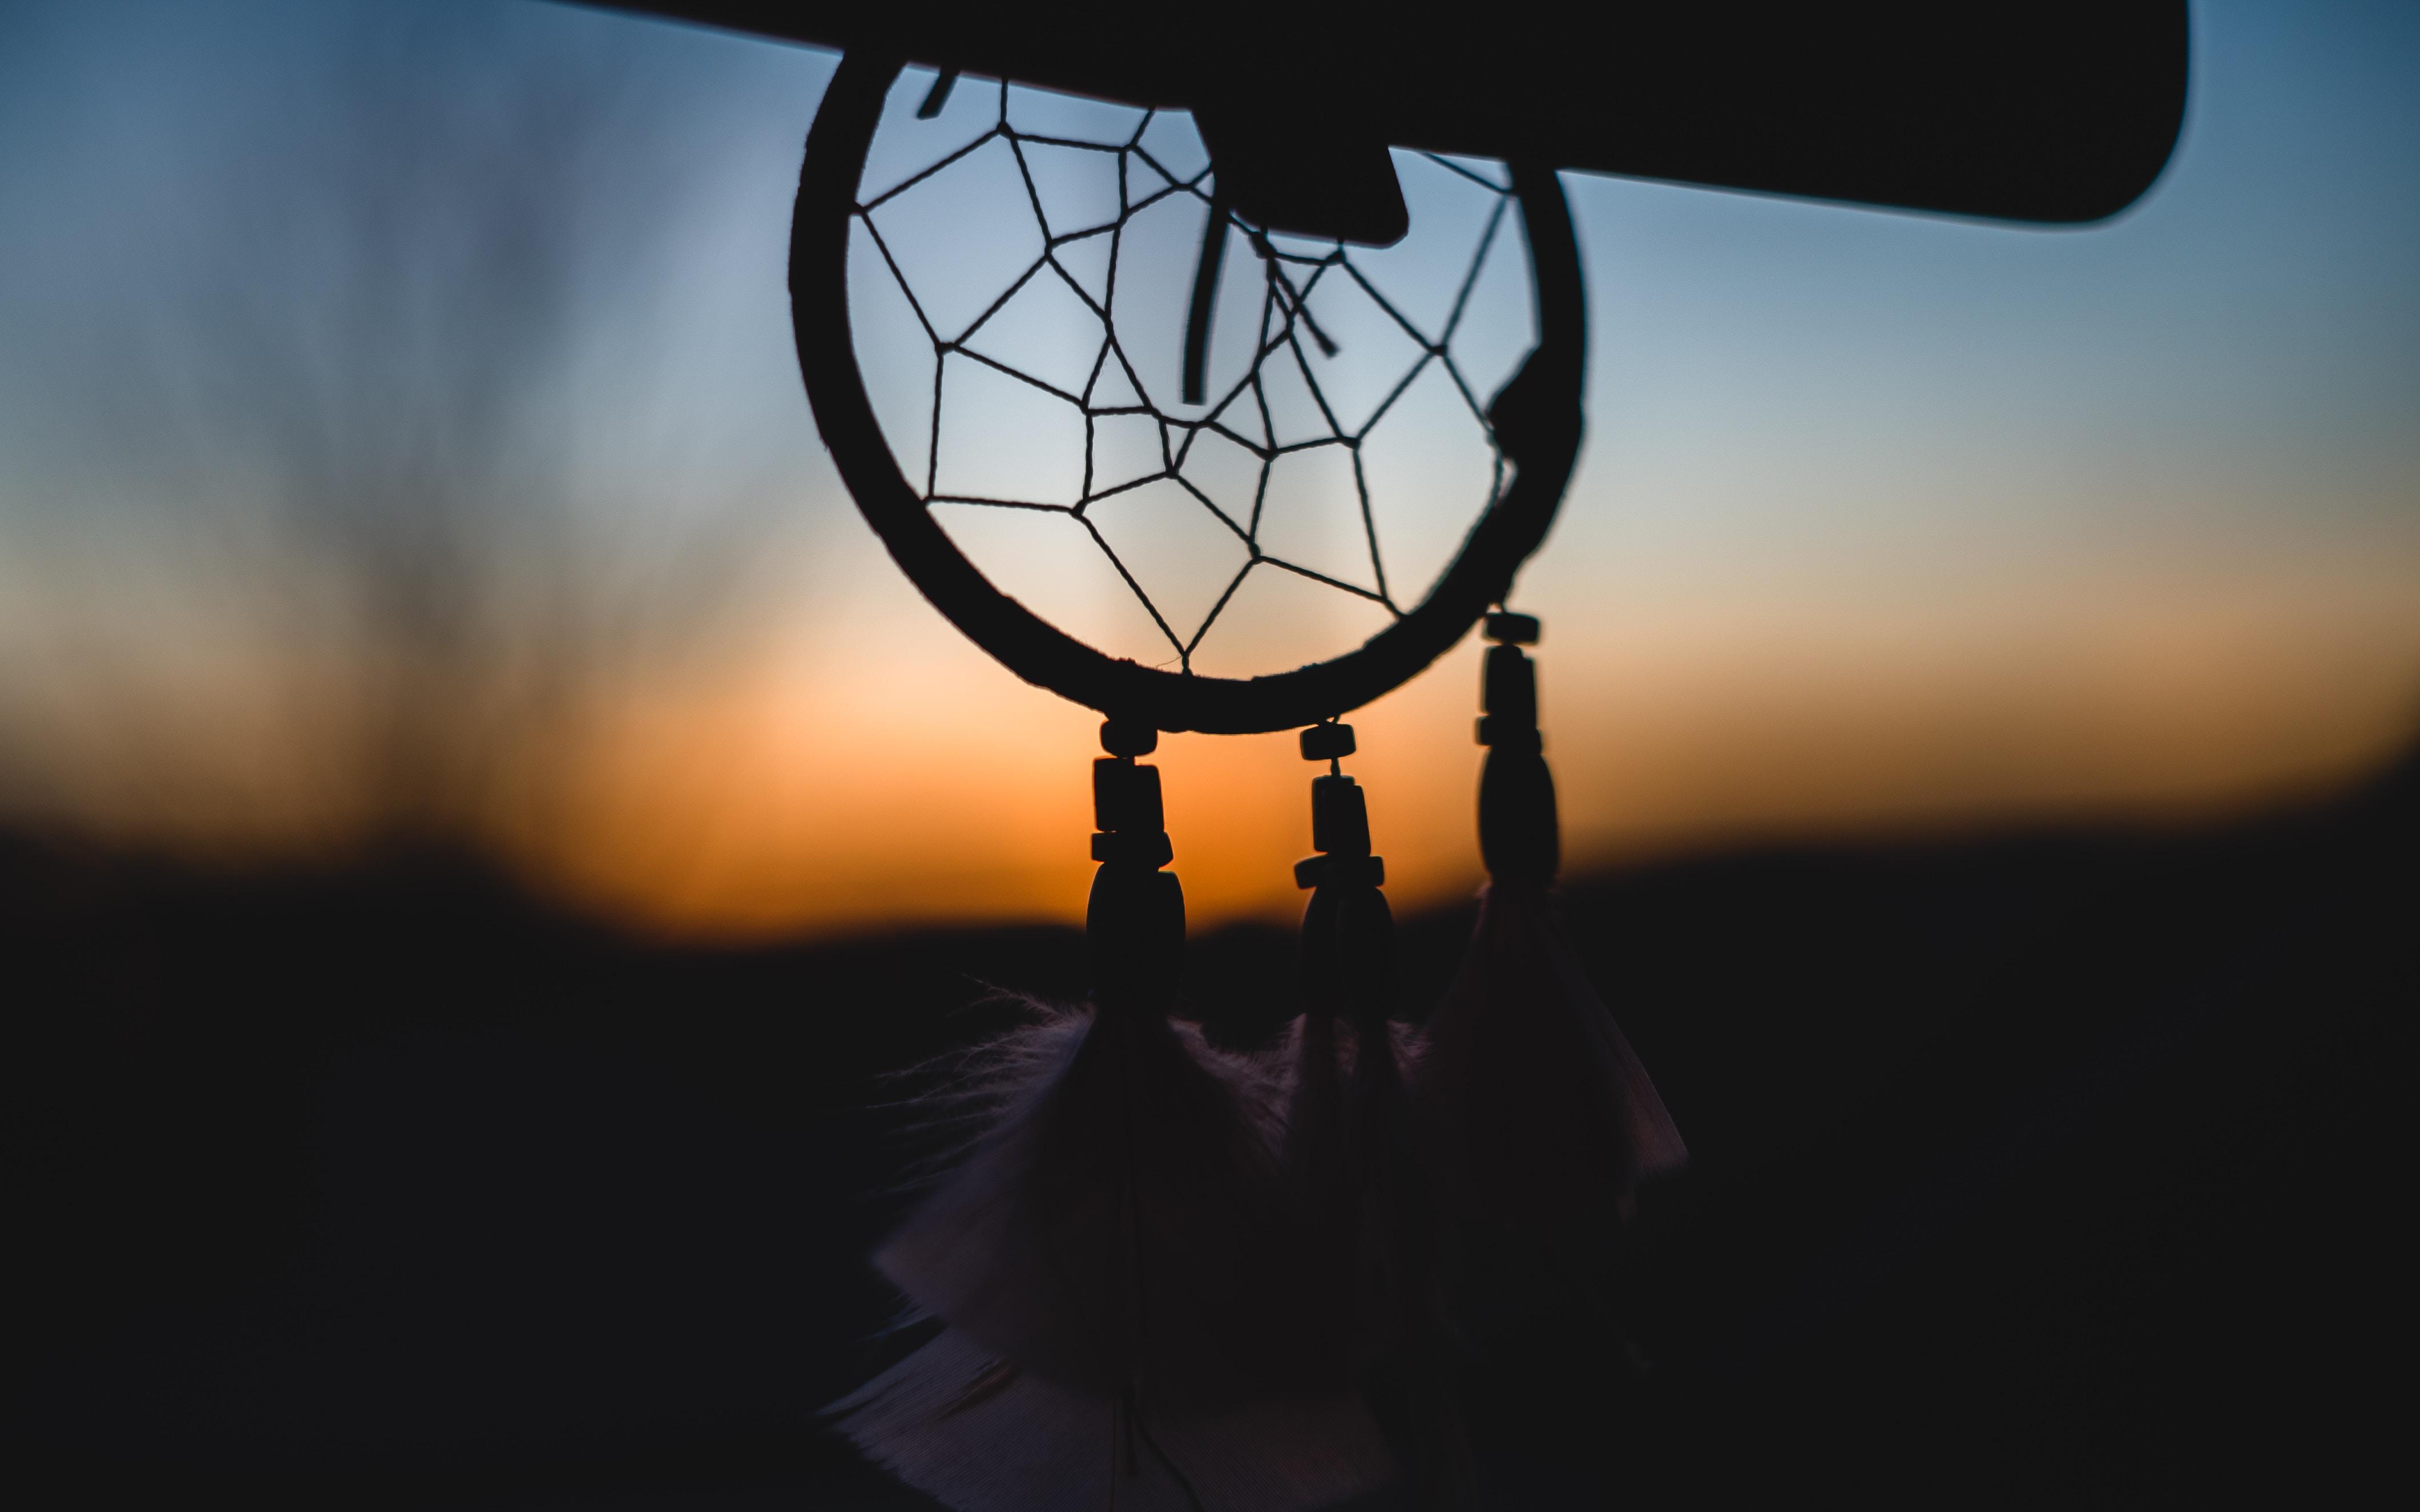 Daydreaming haiku stories